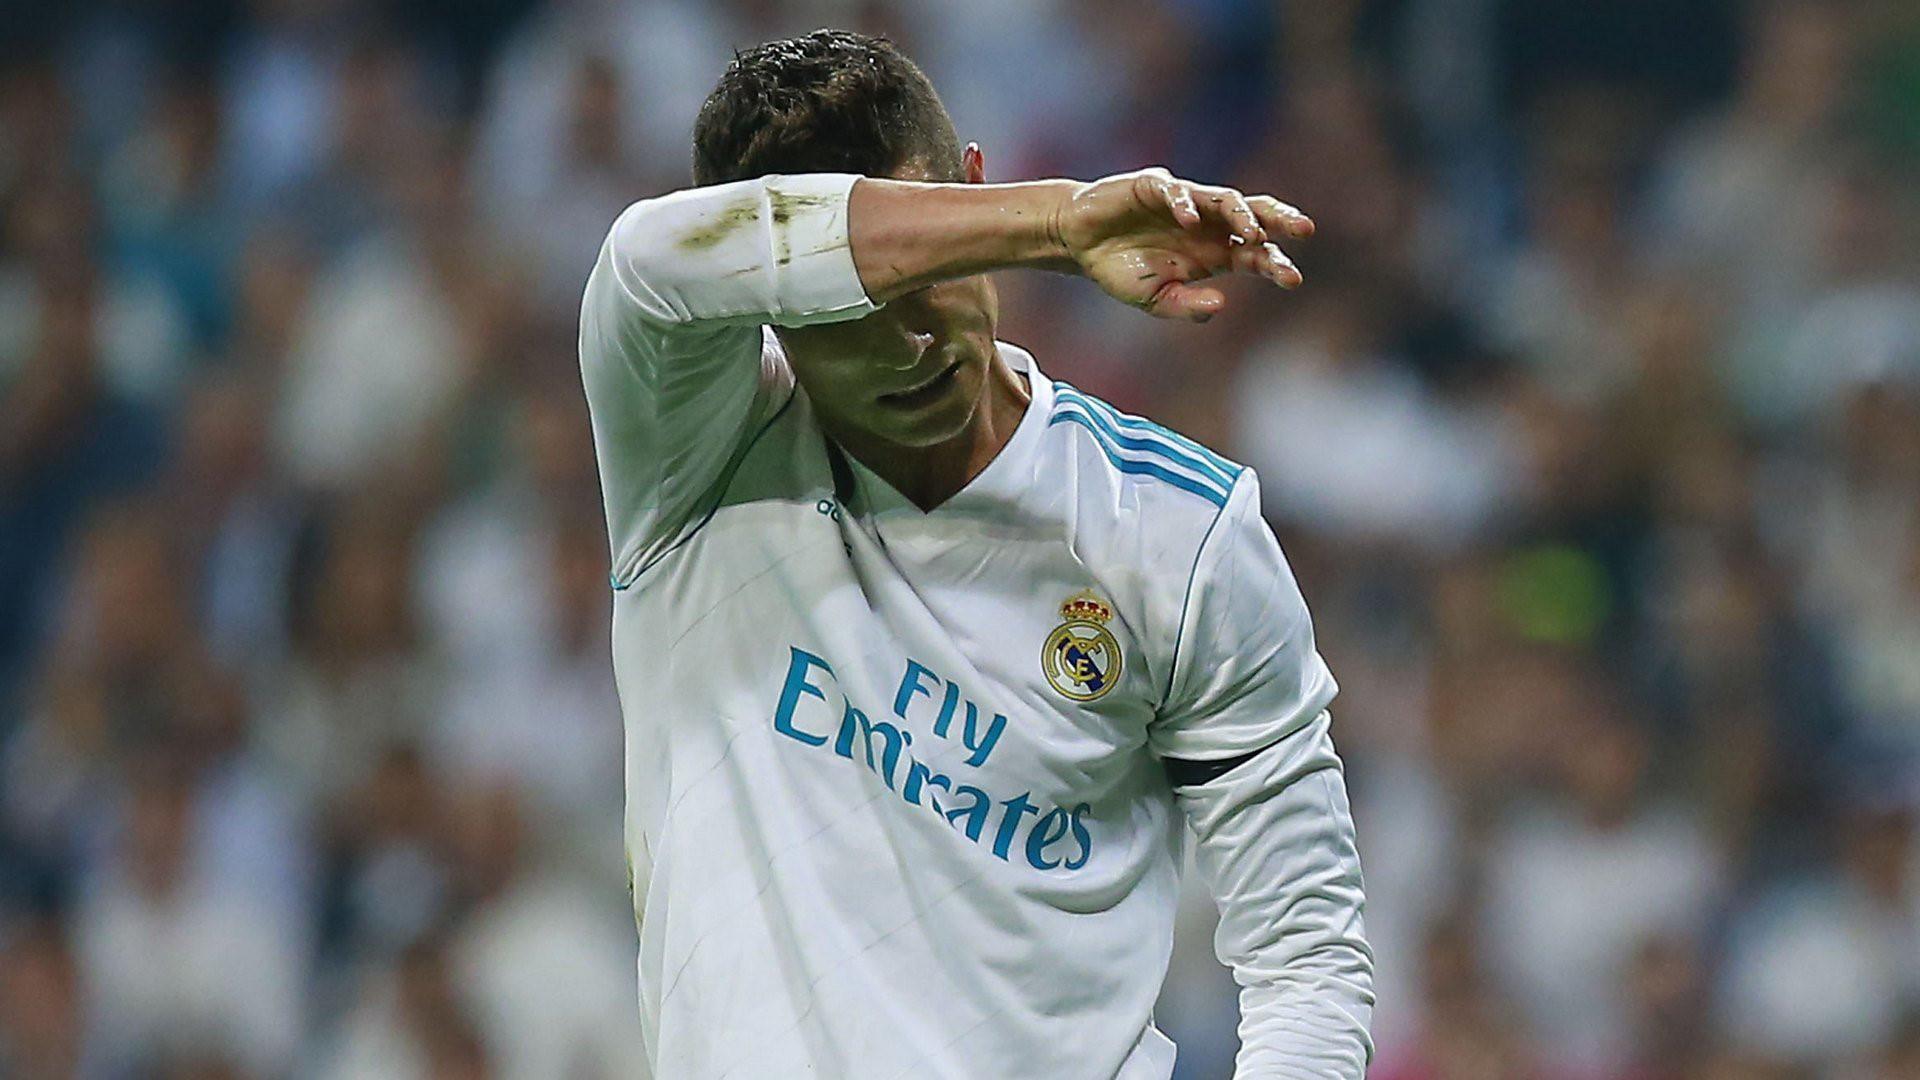 Ronaldo chuẩn bị xác lập kỷ lục buồn La Liga - Bóng Đá